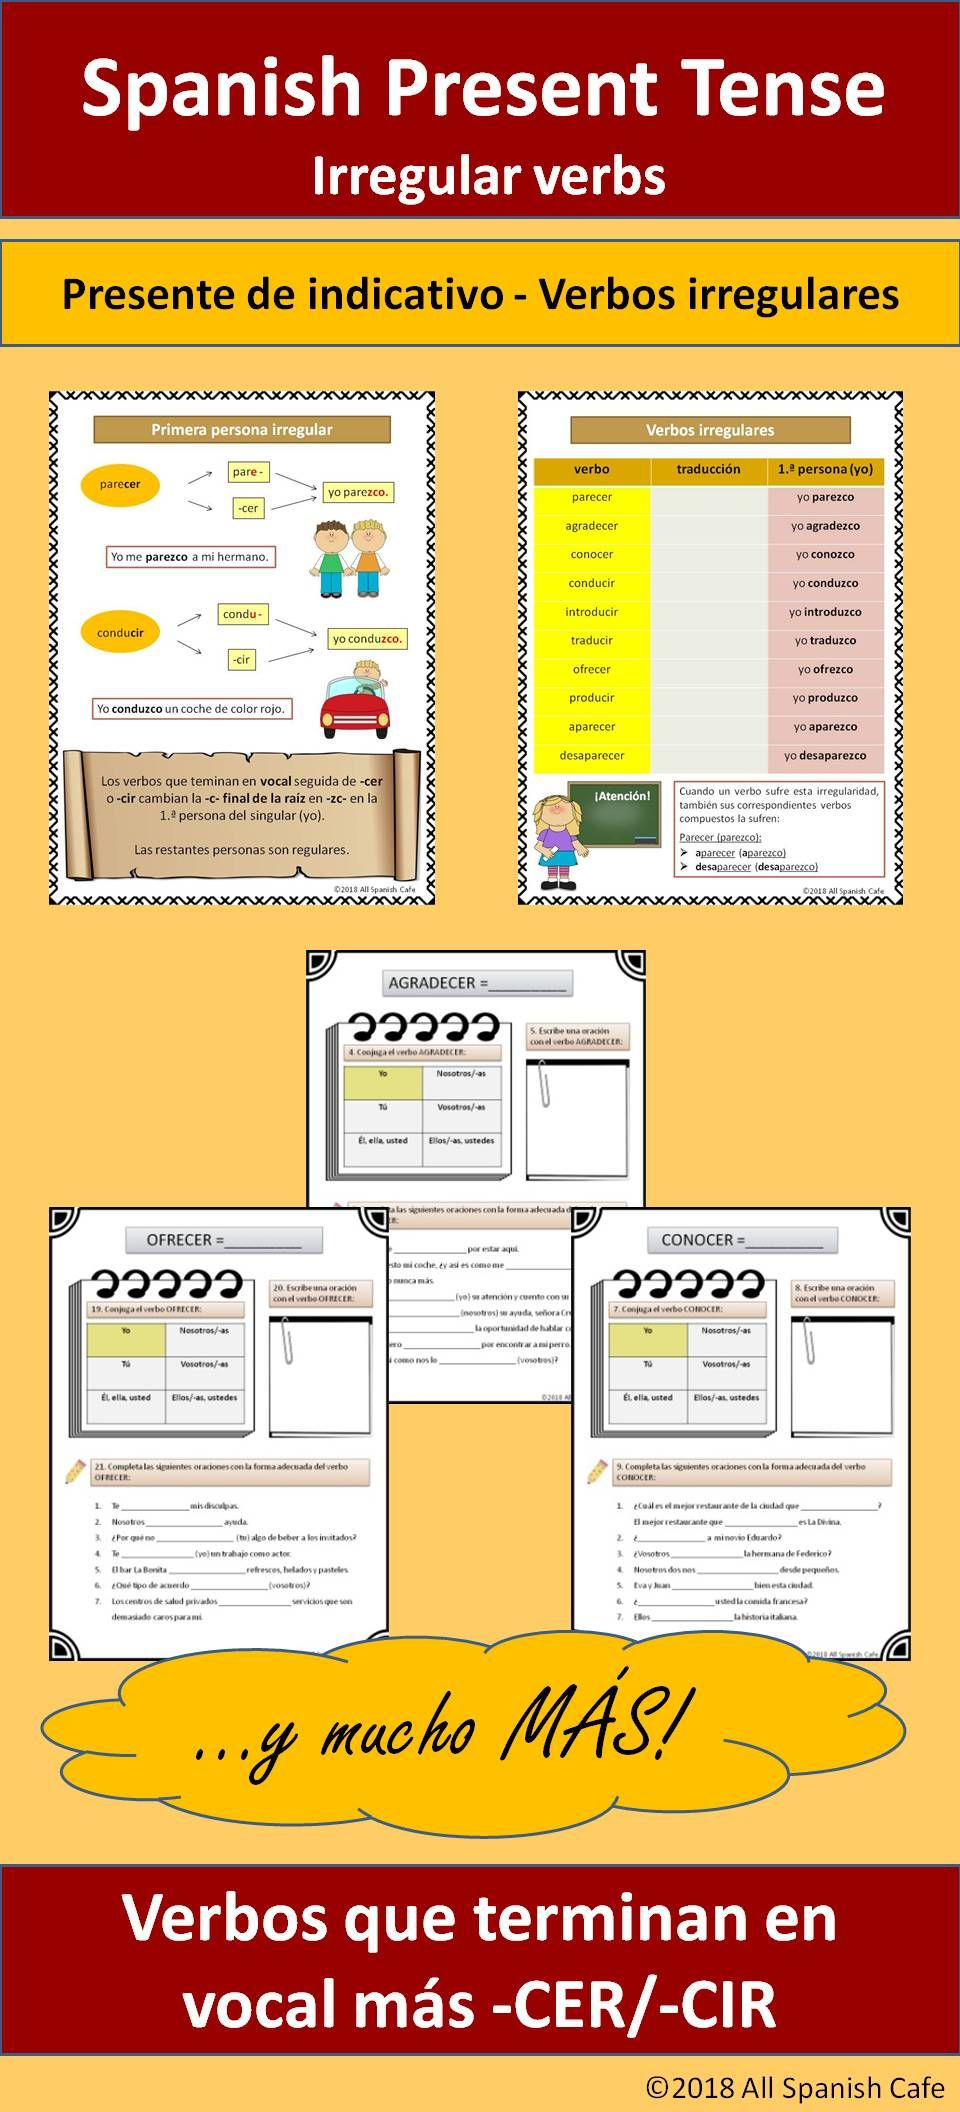 Spanish Present Tense Irregular Verbs Presente De Indicativo Verbos Irregulares Verbo Spanish Teacher Resources Irregular Verbs Spanish Language Learning [ 2112 x 960 Pixel ]